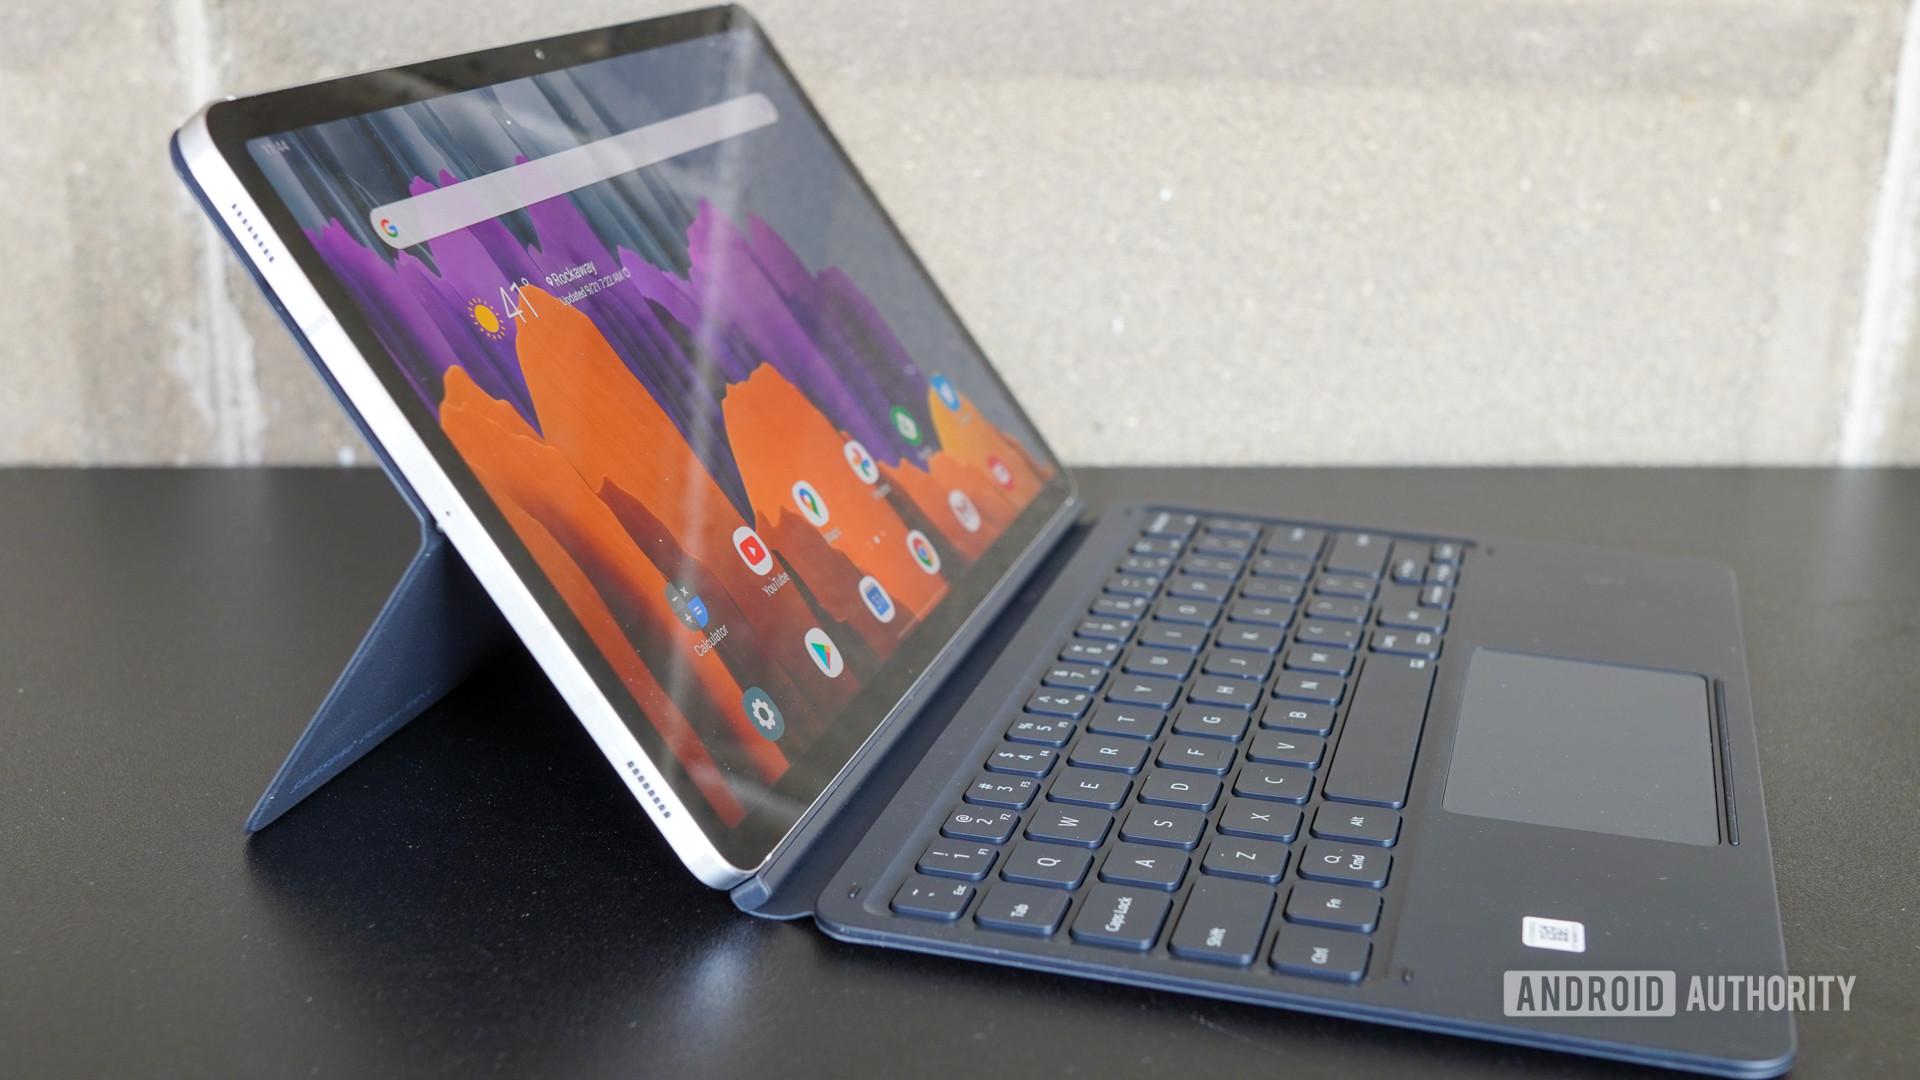 Samsung Galaxy Tab S7 left view